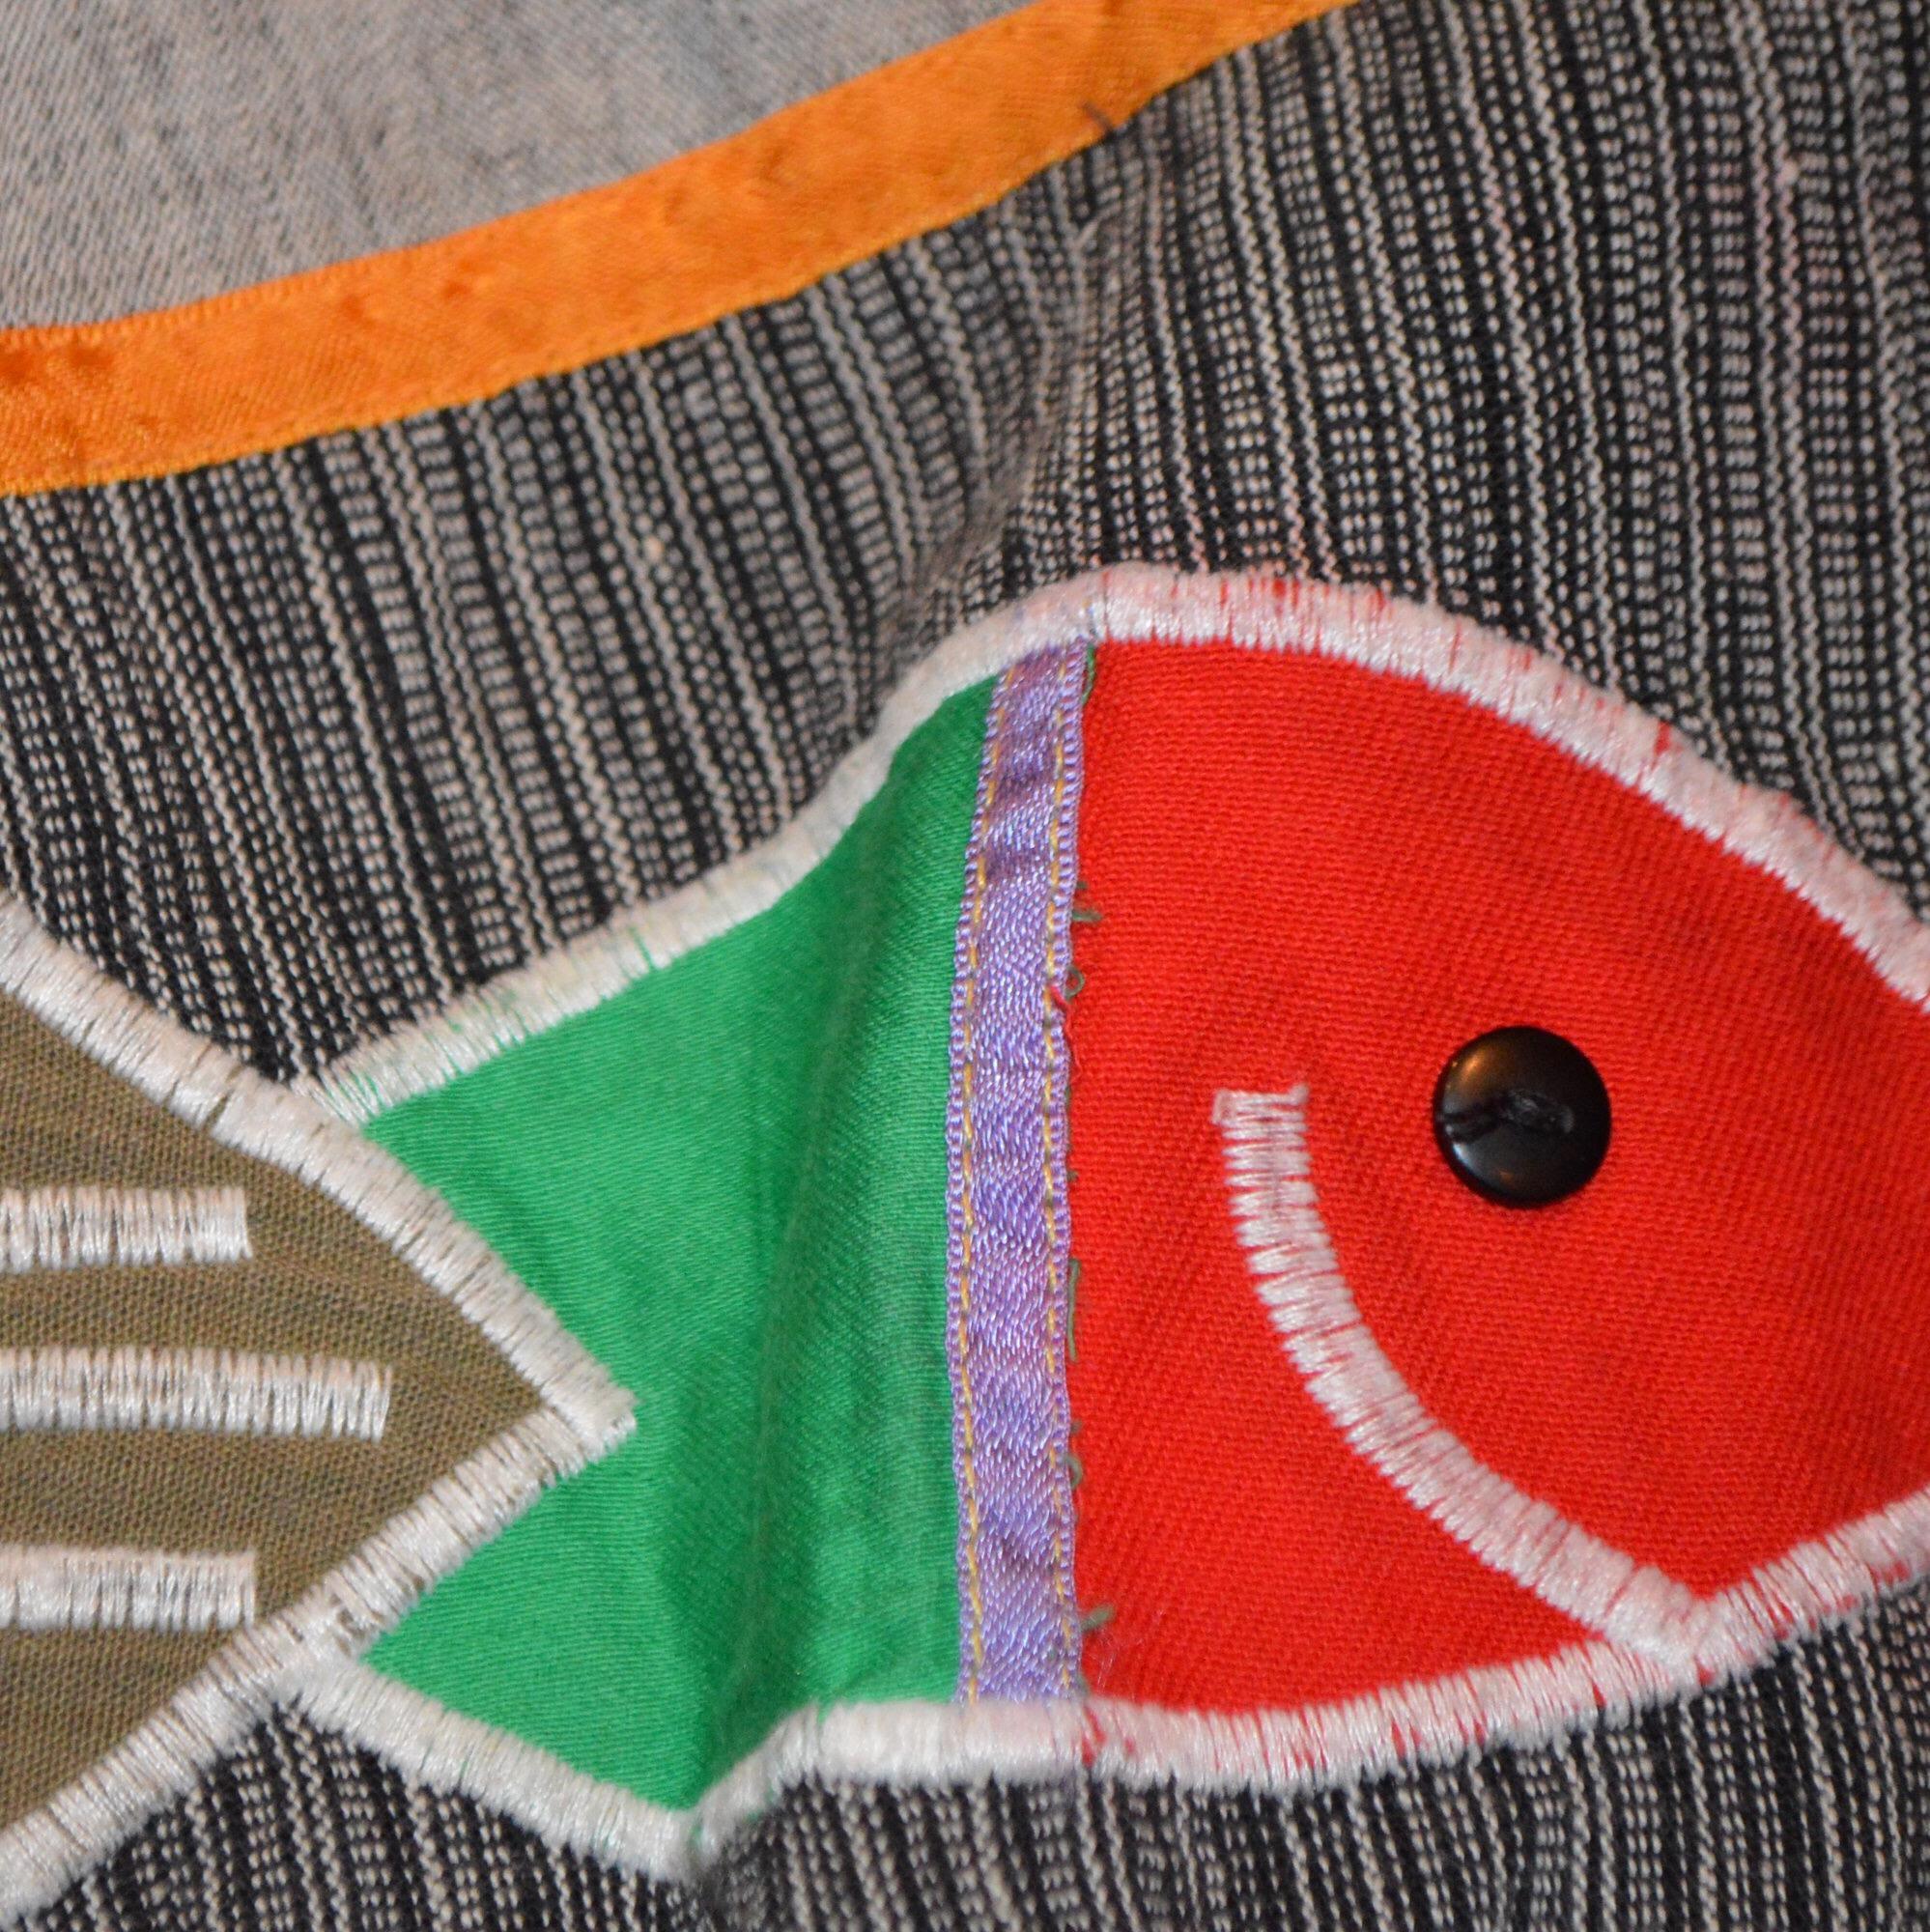 MEXICO製 SAKANA刺繍 ブルゾン!! メンズ レディース